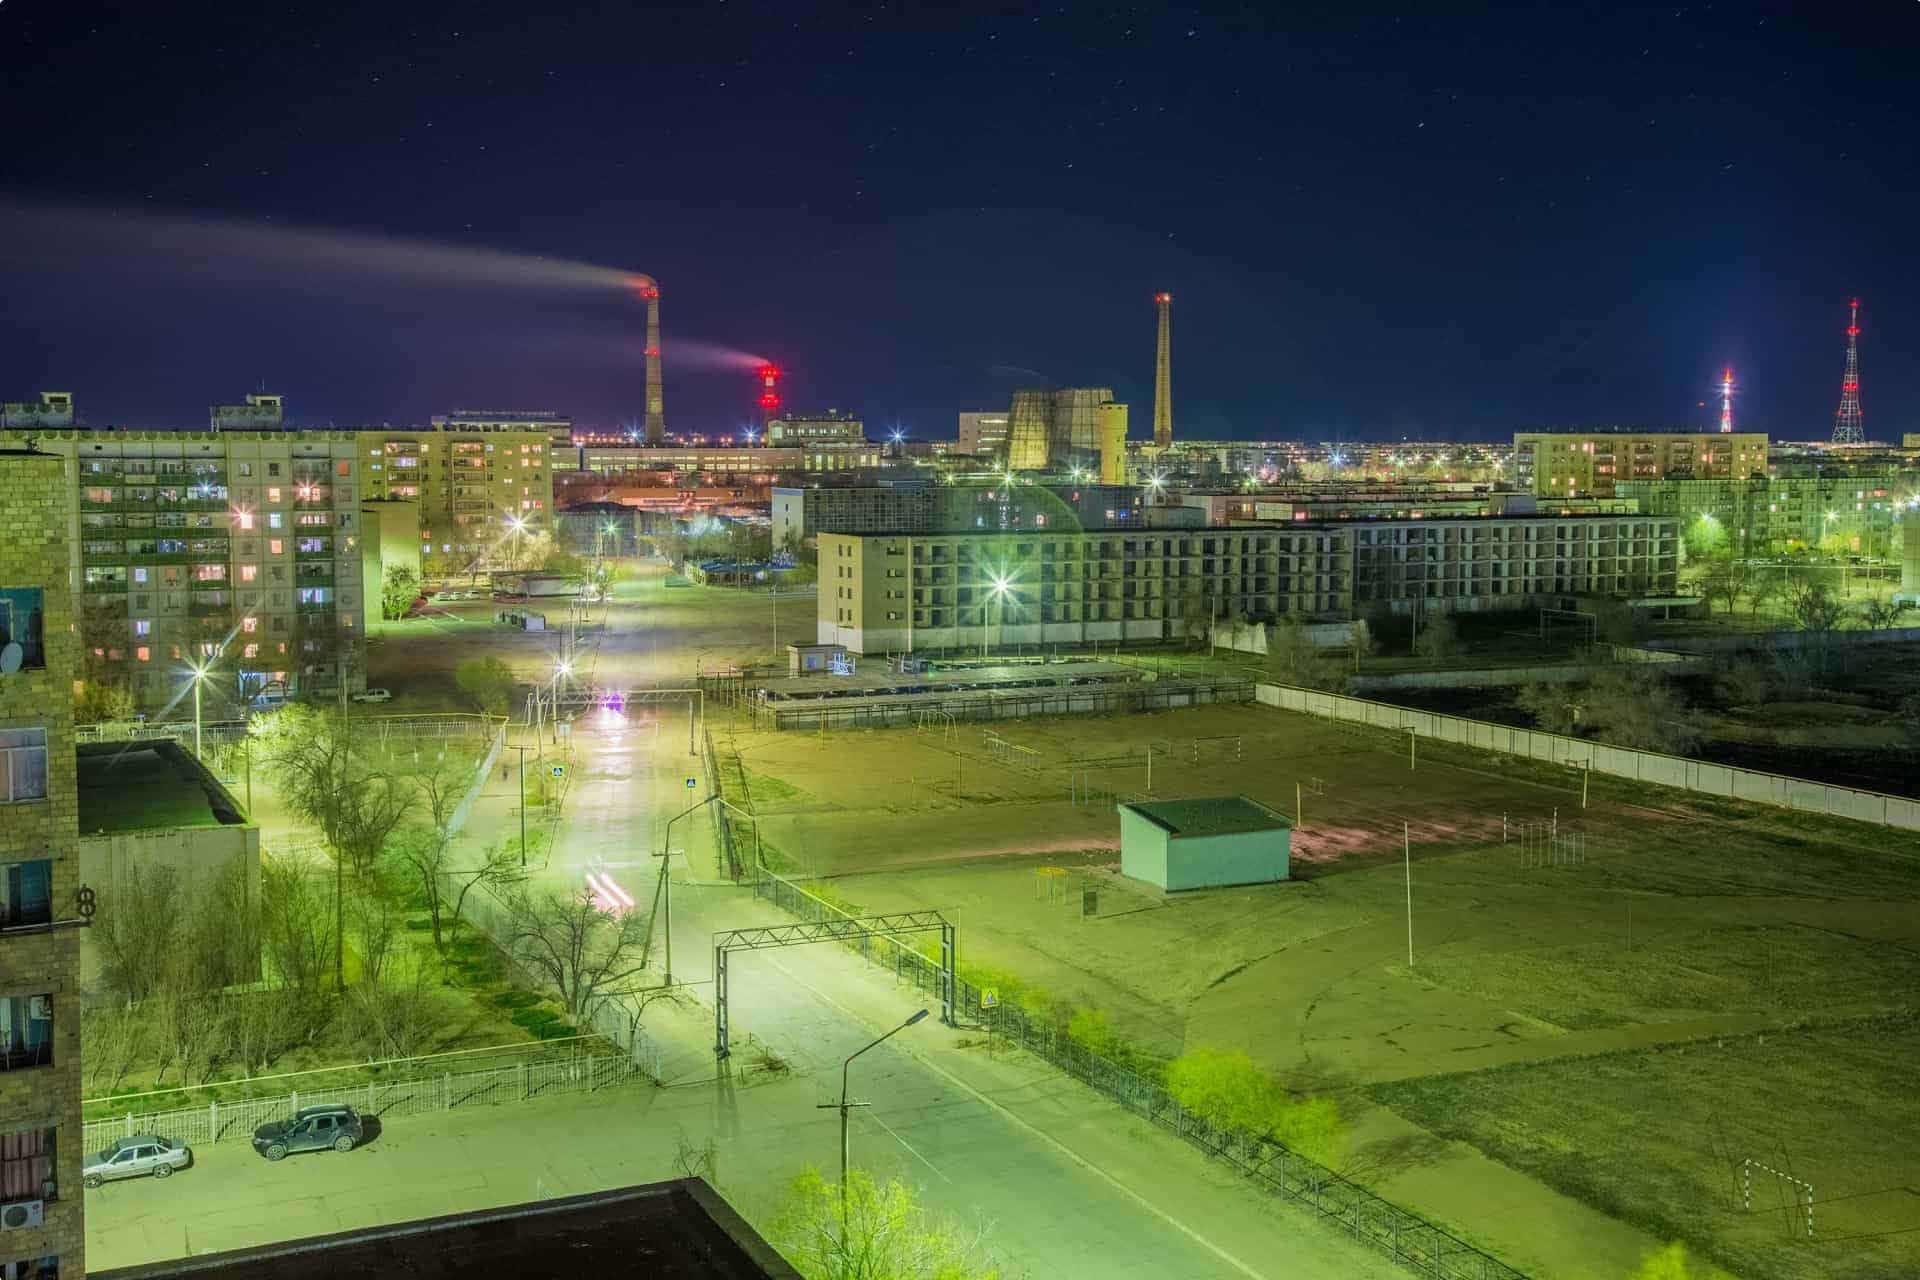 Aerial night cityscape of Baikonur, Kazakhstan